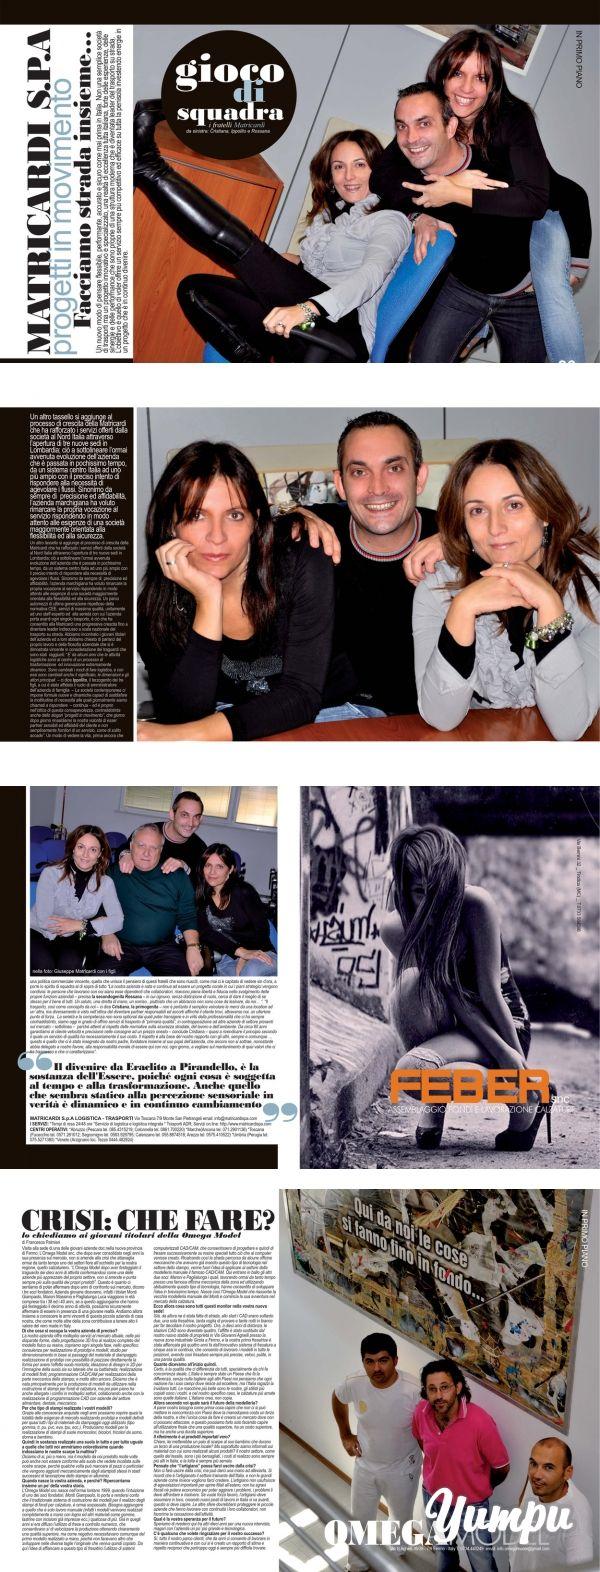 https://www.donnaimpresa.com progetti in movimento - Donna Impresa Magazine - Magazine with 4 pages: progettiin movimento - Donna Impresa Magazine